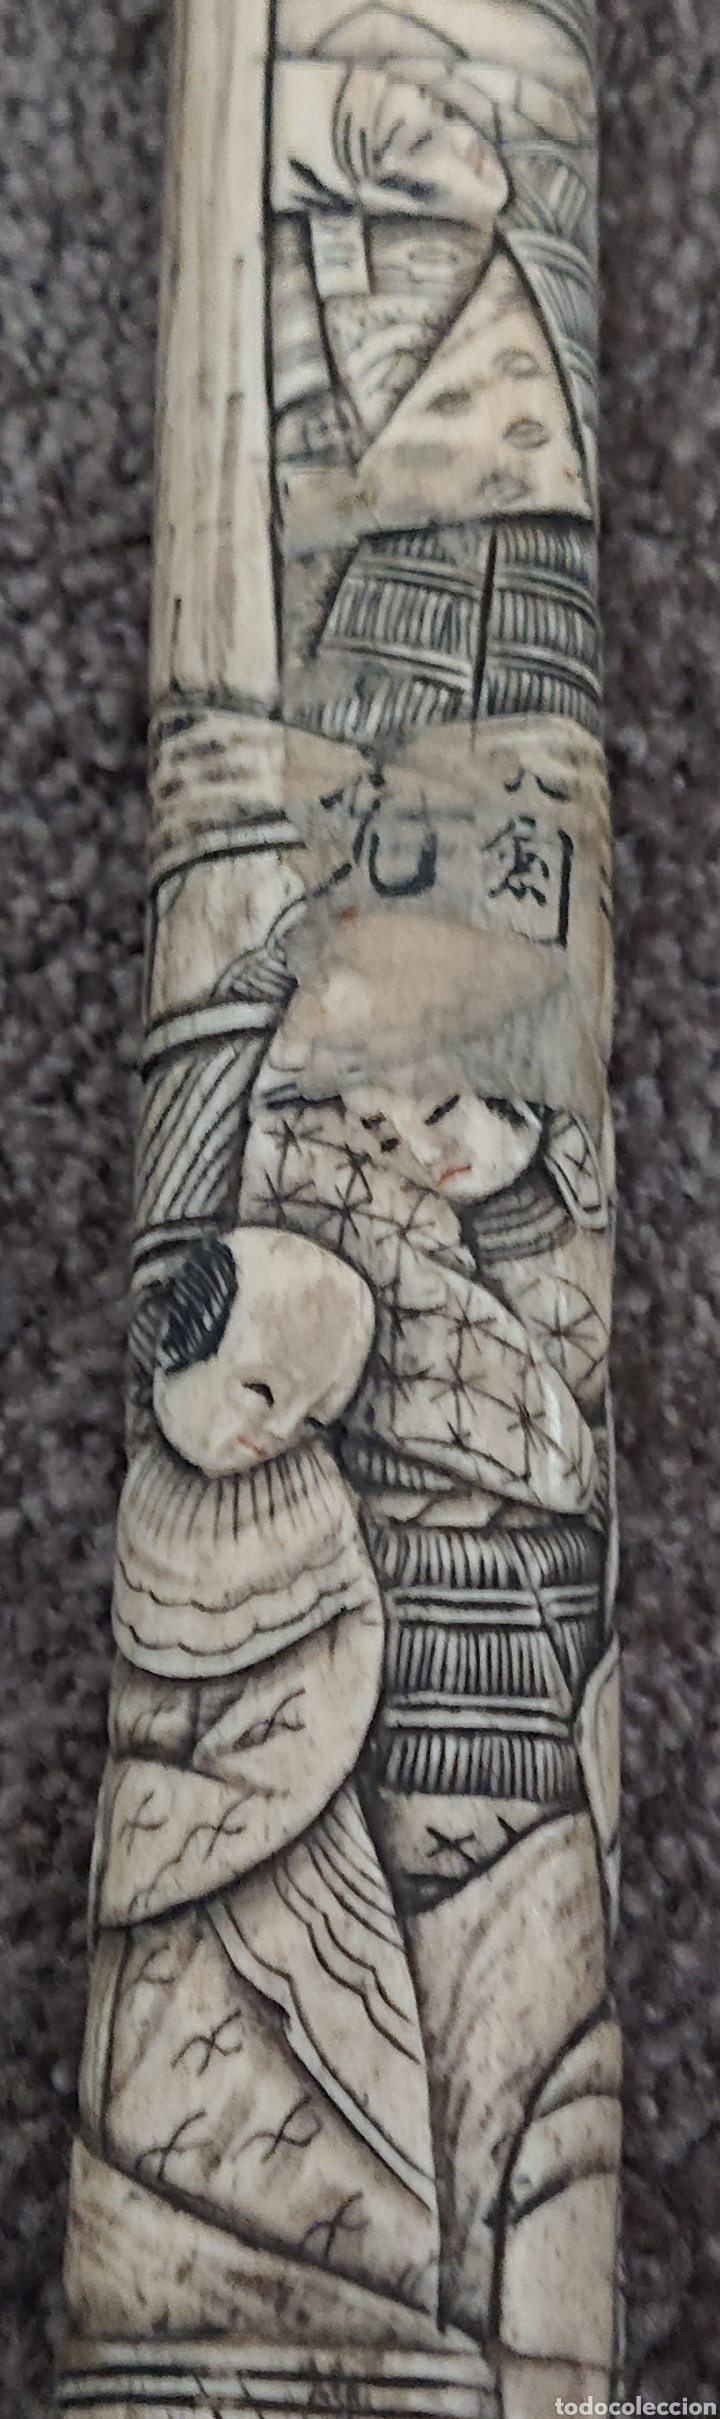 Arte: Funda sable o espada japonés, Japón, hueso o similar, gran pieza, ved fotos - Foto 6 - 276801593